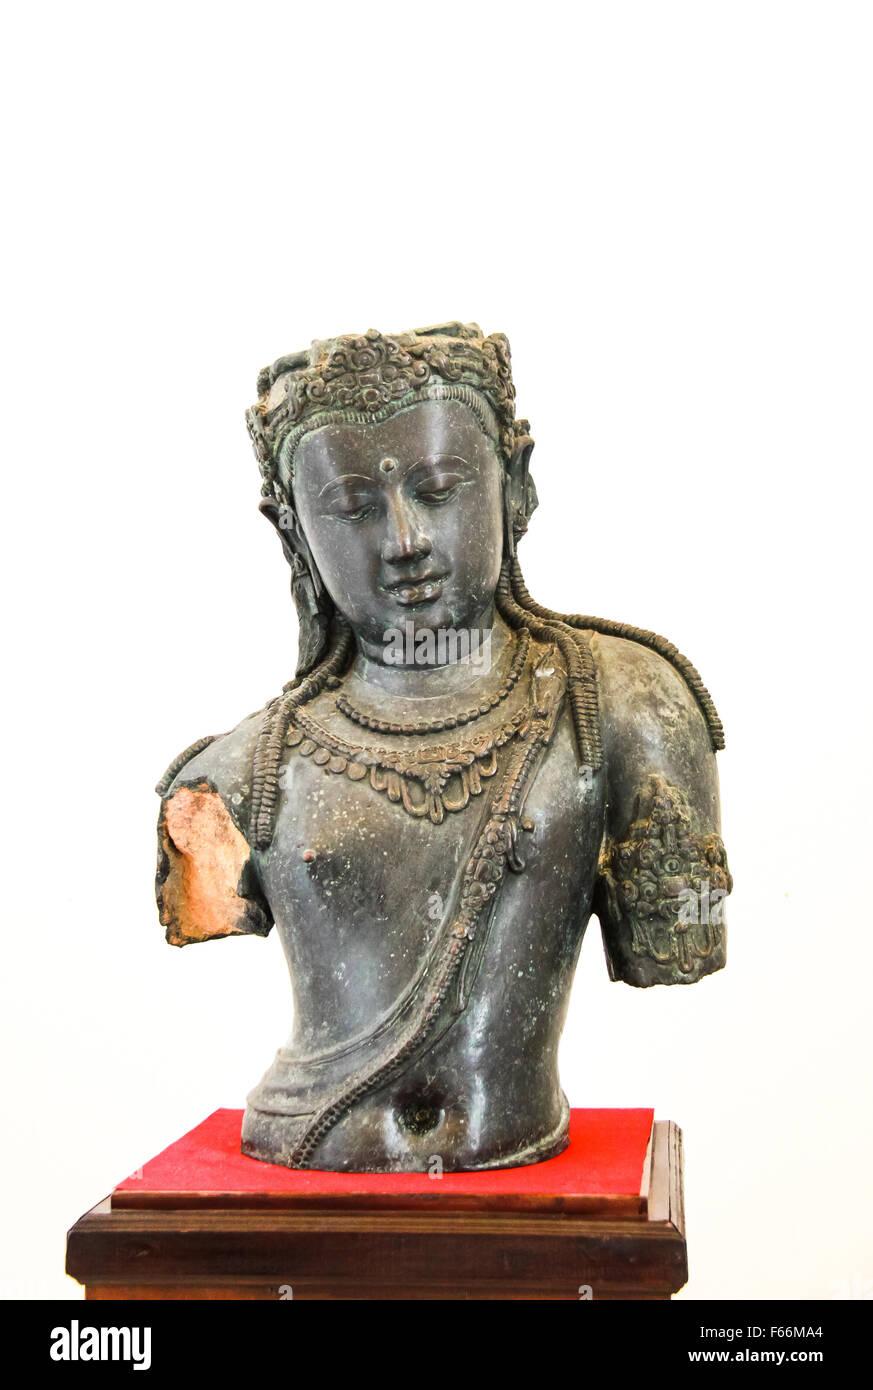 The Antique Bodhisattva Statue - Surat Thani, Thailand - Stock Image